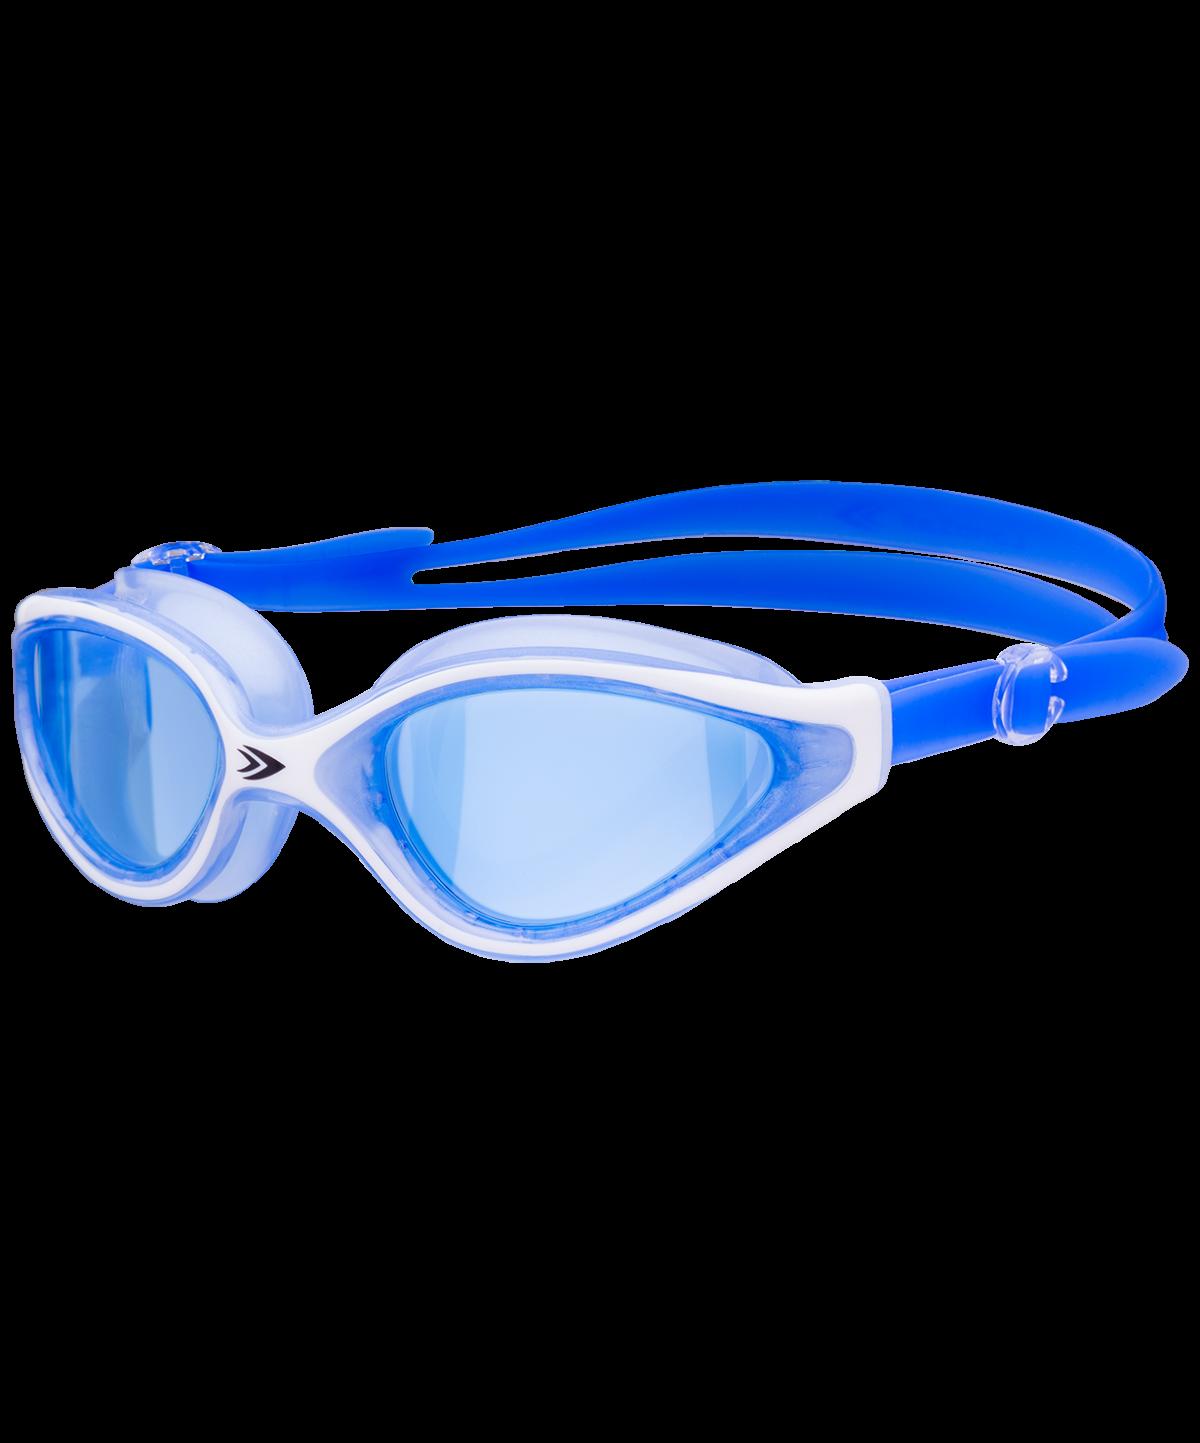 LONGSAIL Serena Очки для плавания  L011002: синий/белый - 1